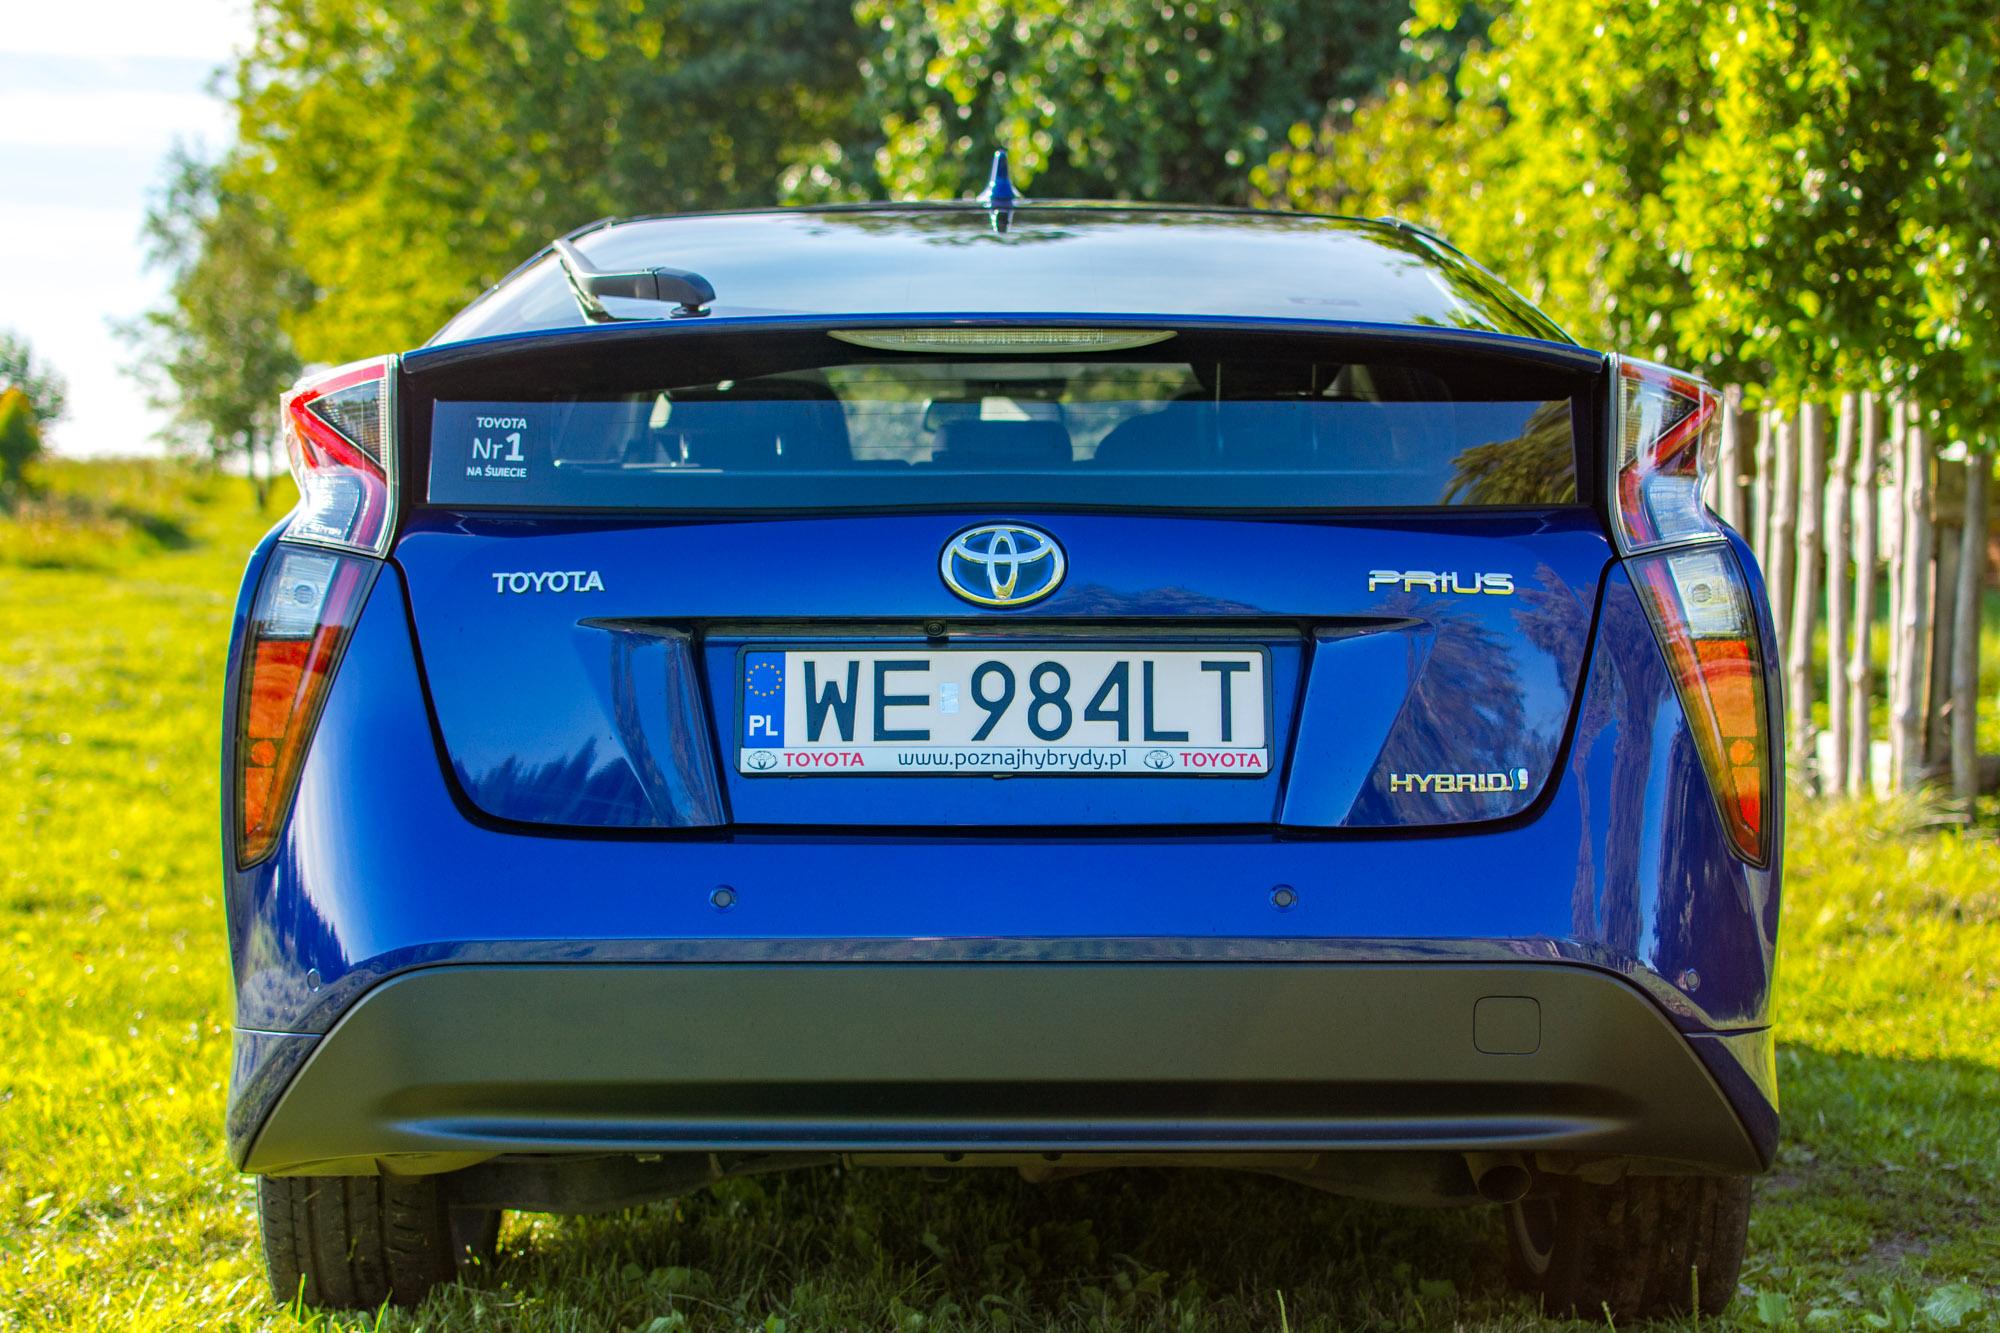 Toyota-Prius-trawa-9